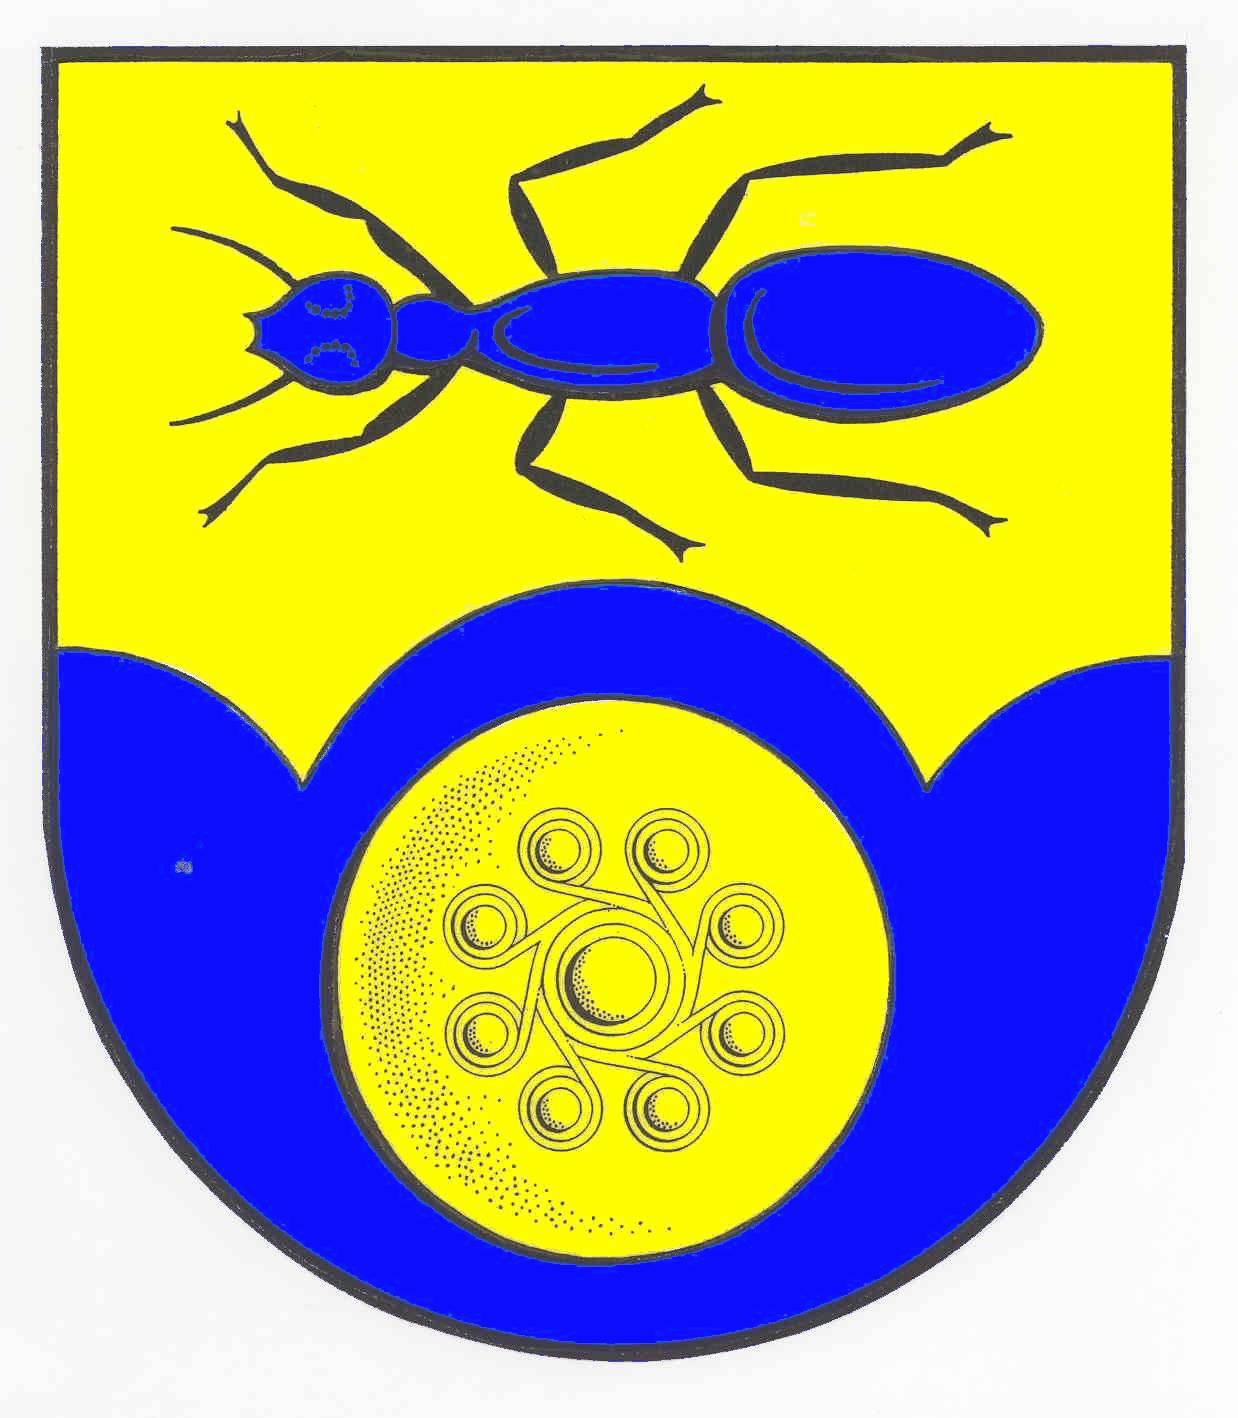 Wappen GemeindeBrekendorf, Kreis Rendsburg-Eckernförde